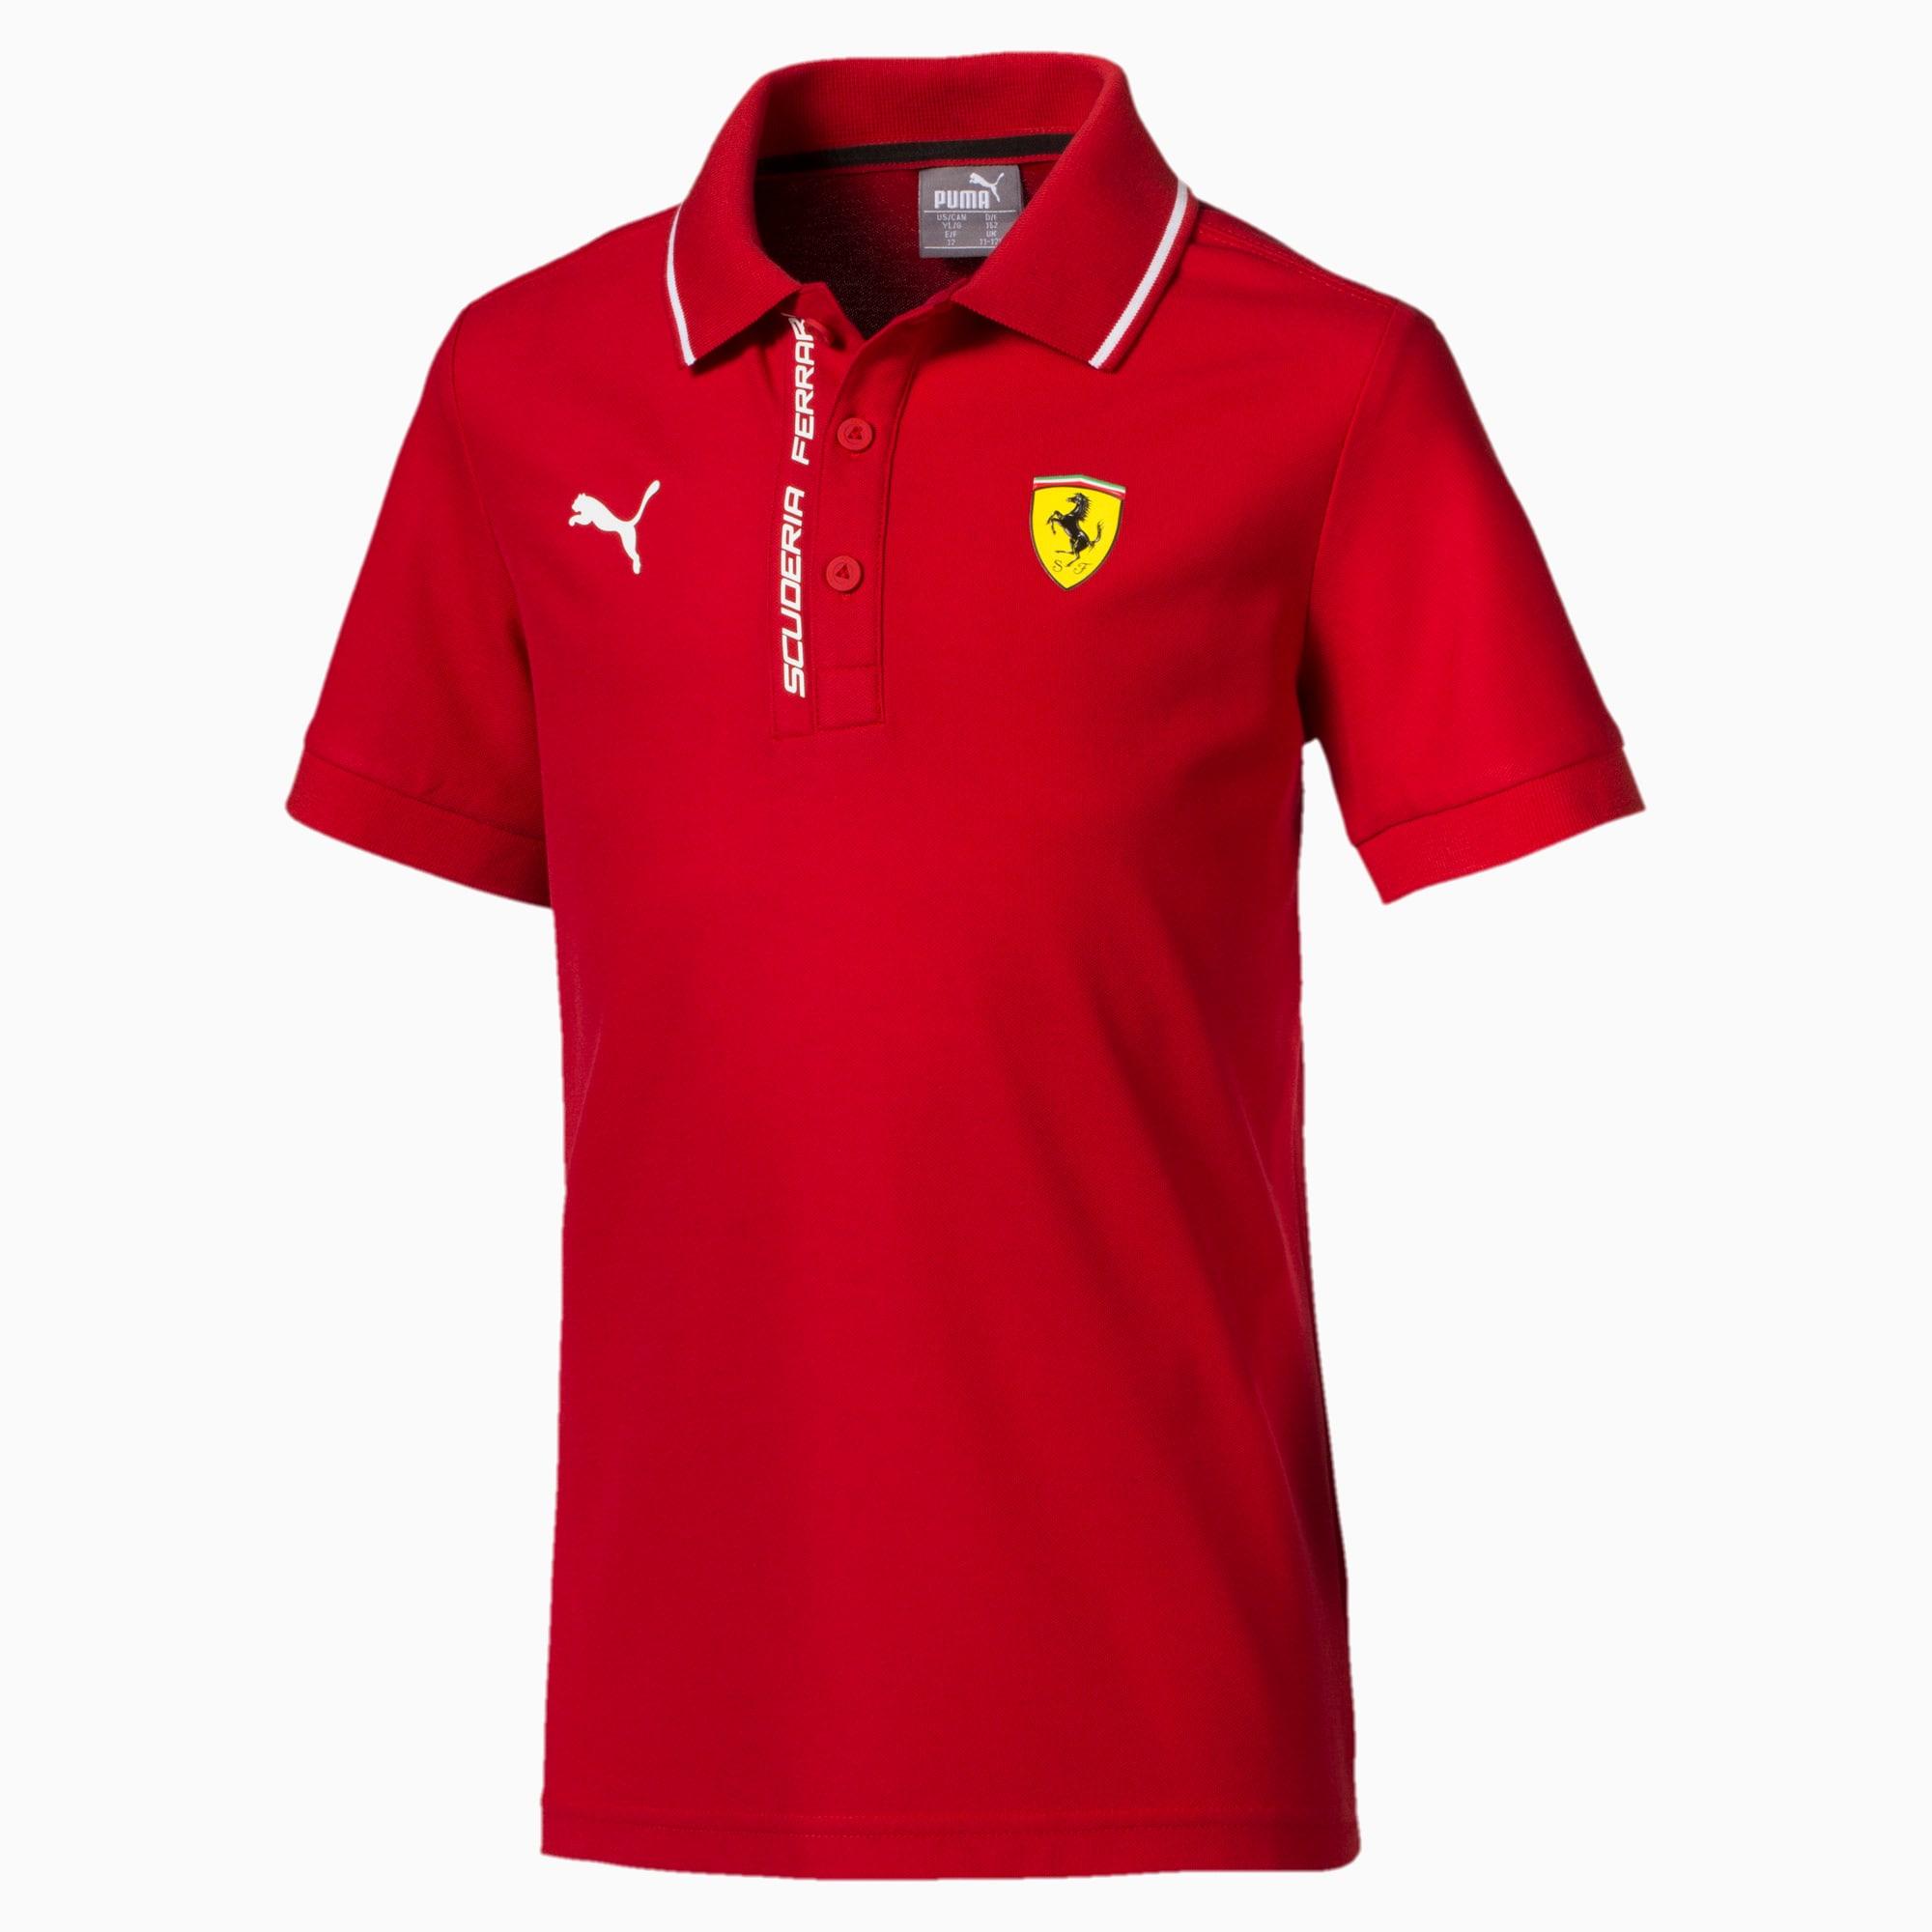 Ferrari Kids Polo Shirt Rosso Corsa Puma Scuderia Ferrari Puma Germany